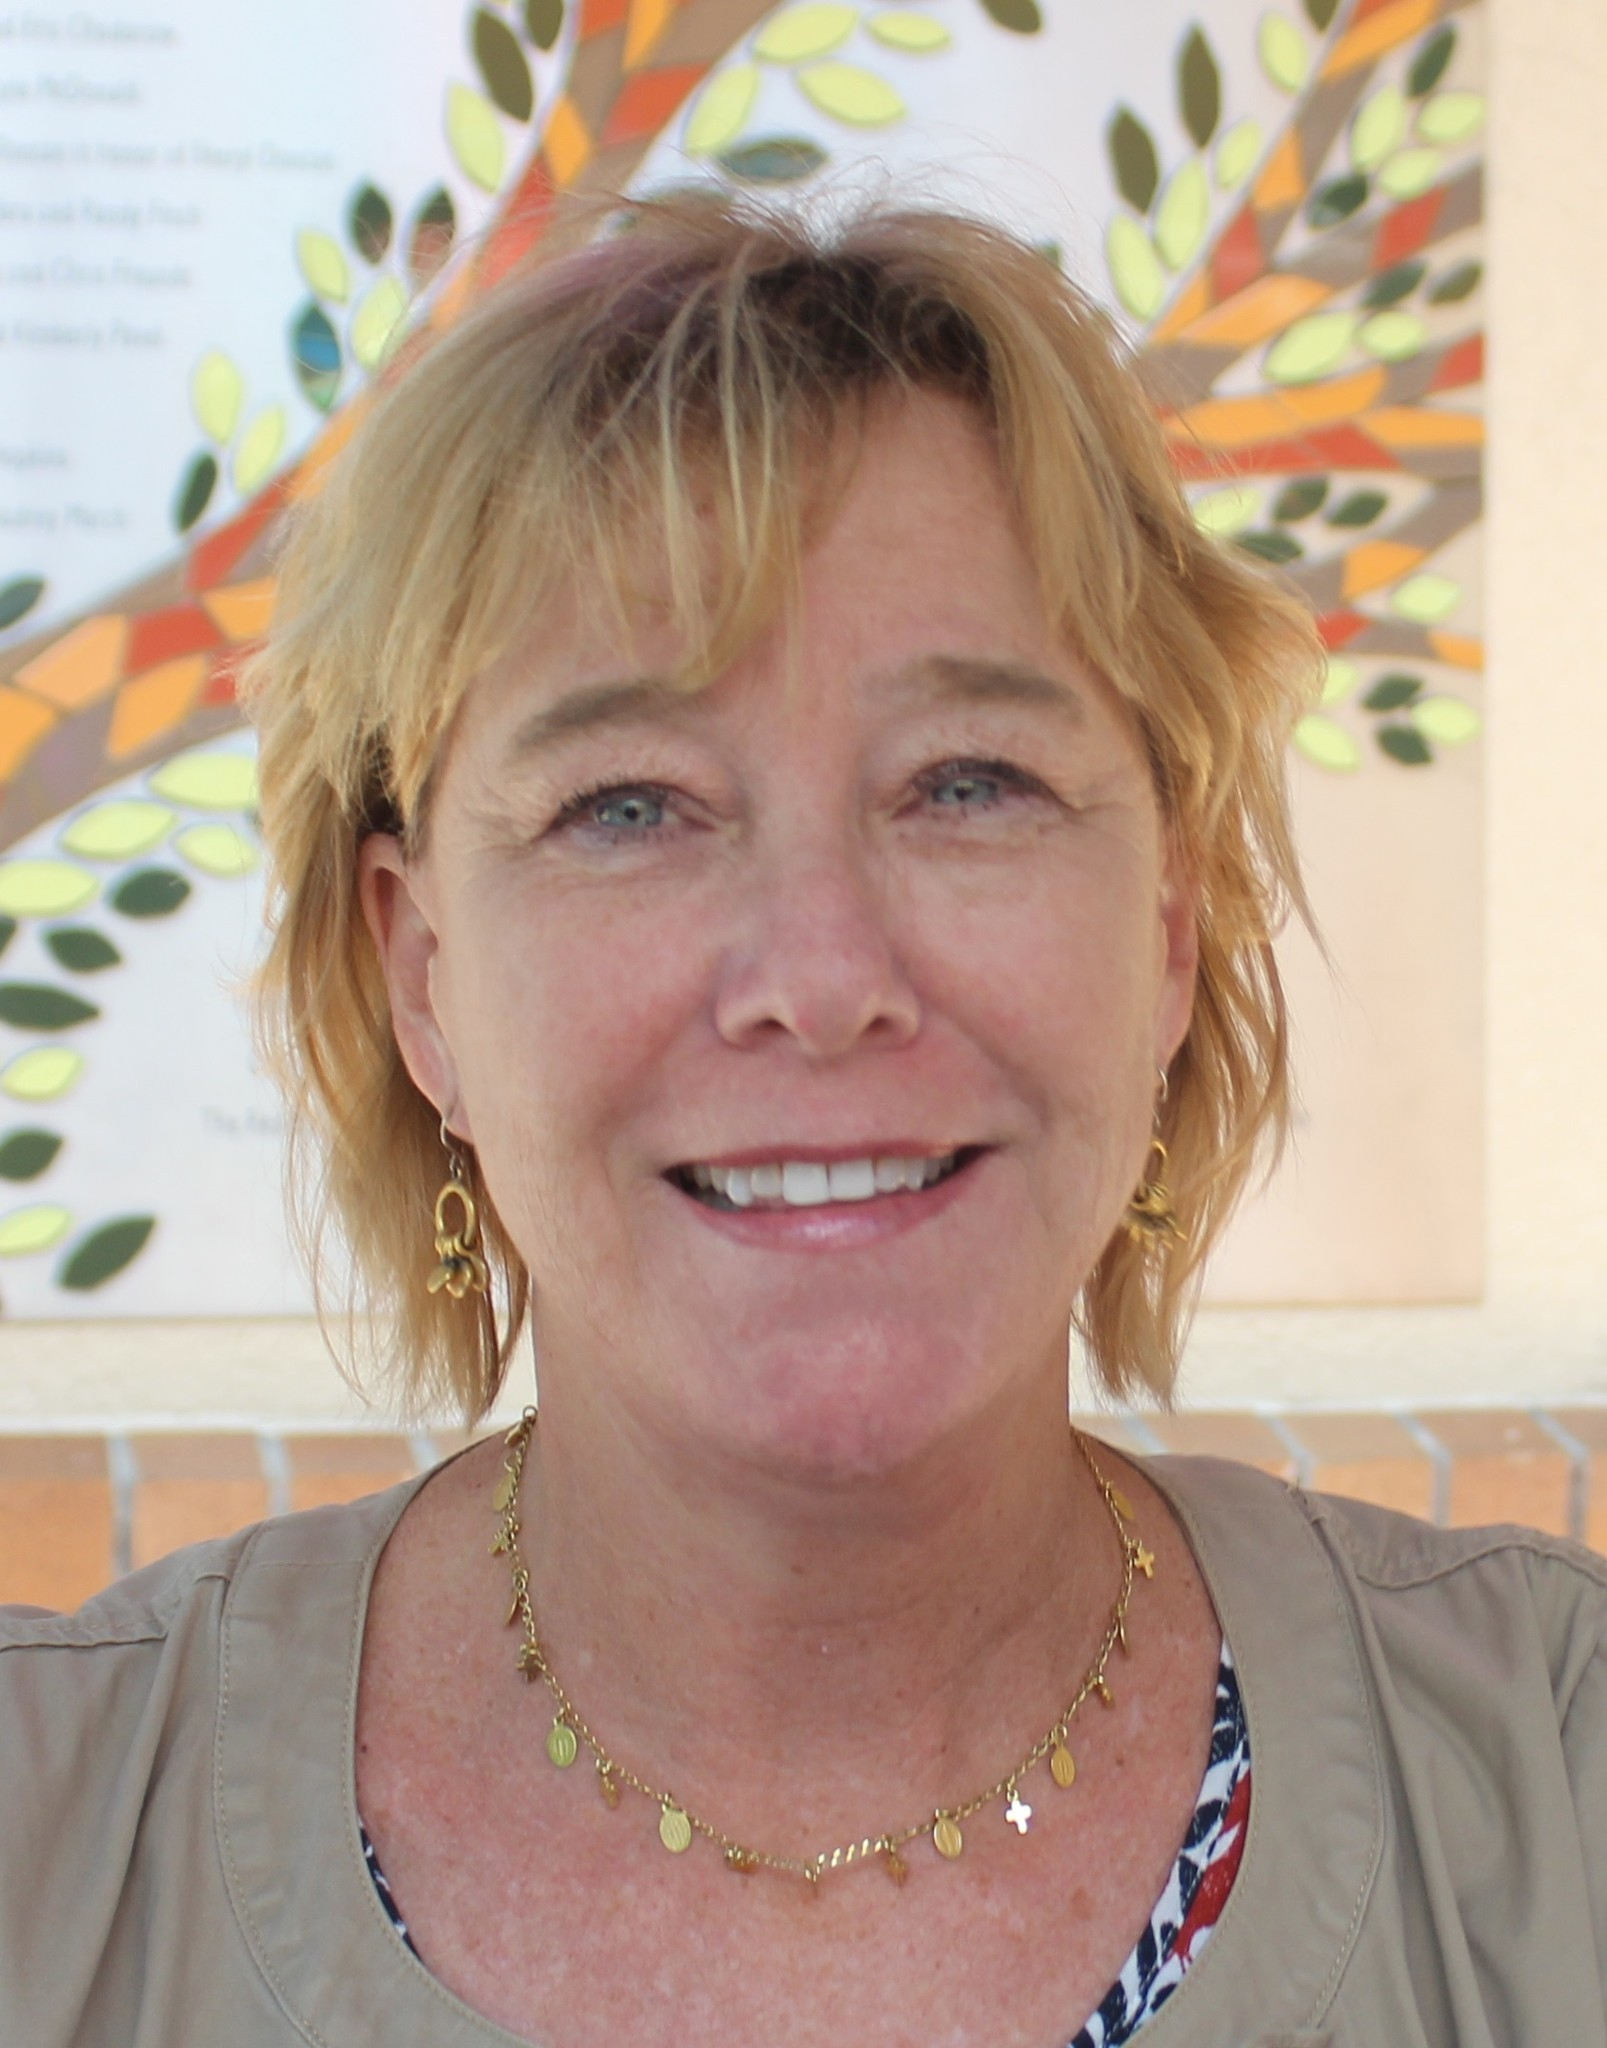 Gillispie head of school Alison Fleming